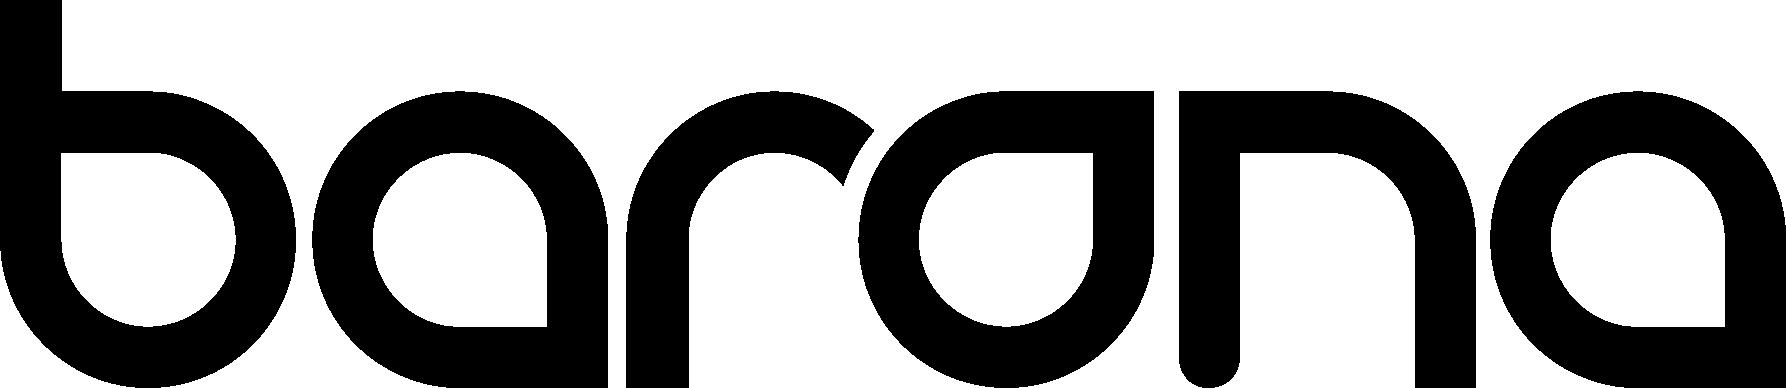 Barona Logo RGB black.png